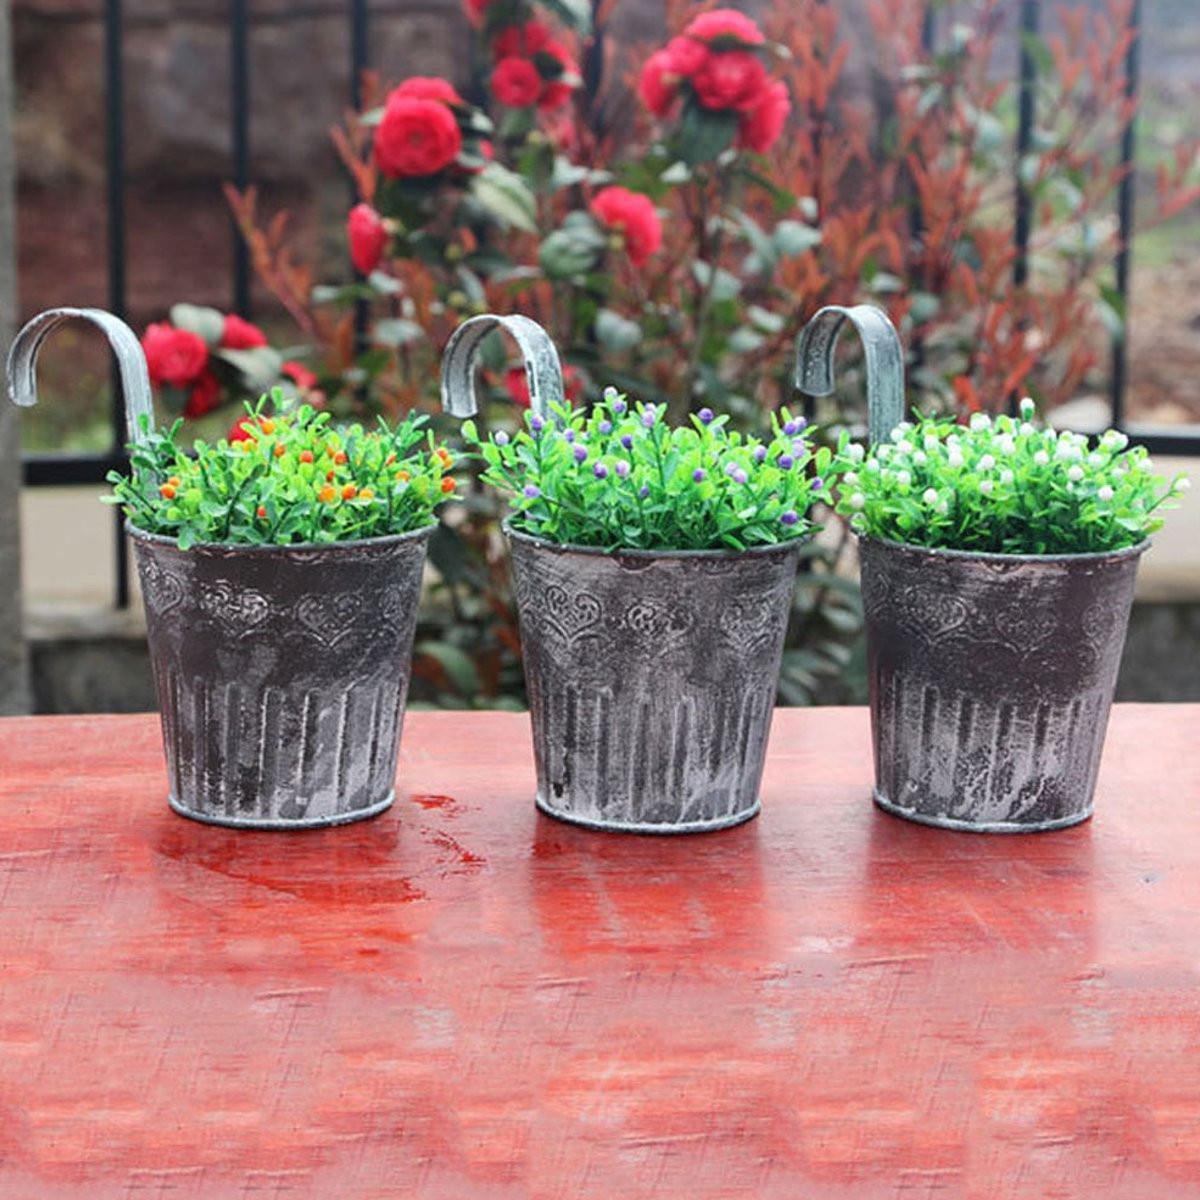 Fullsize Of Balcony Garden Planters